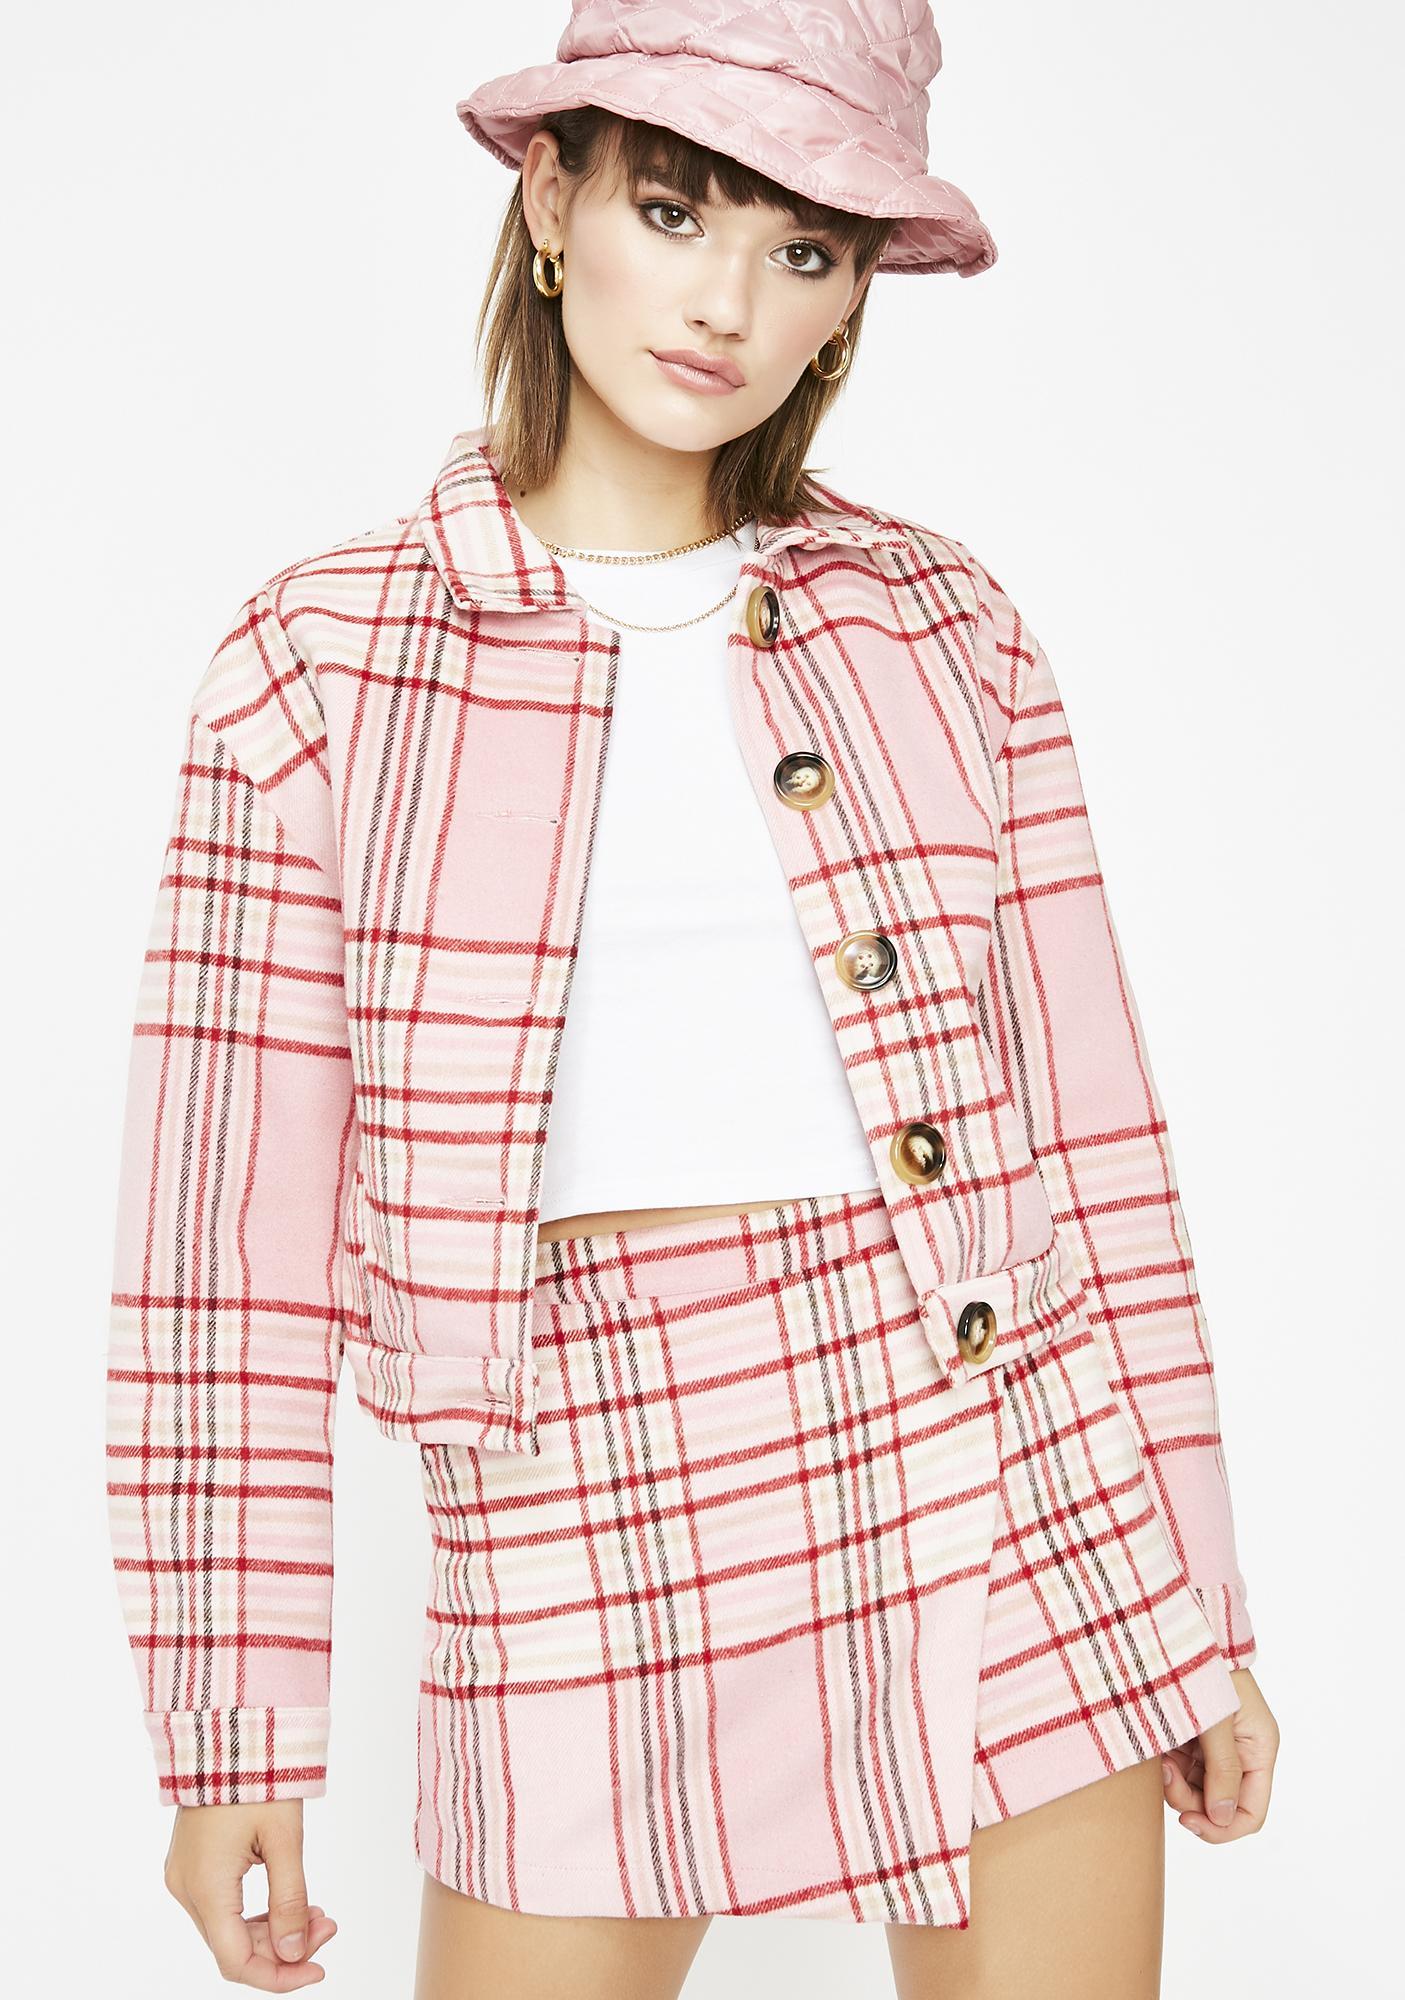 Miss Rumor Has It Plaid Jacket